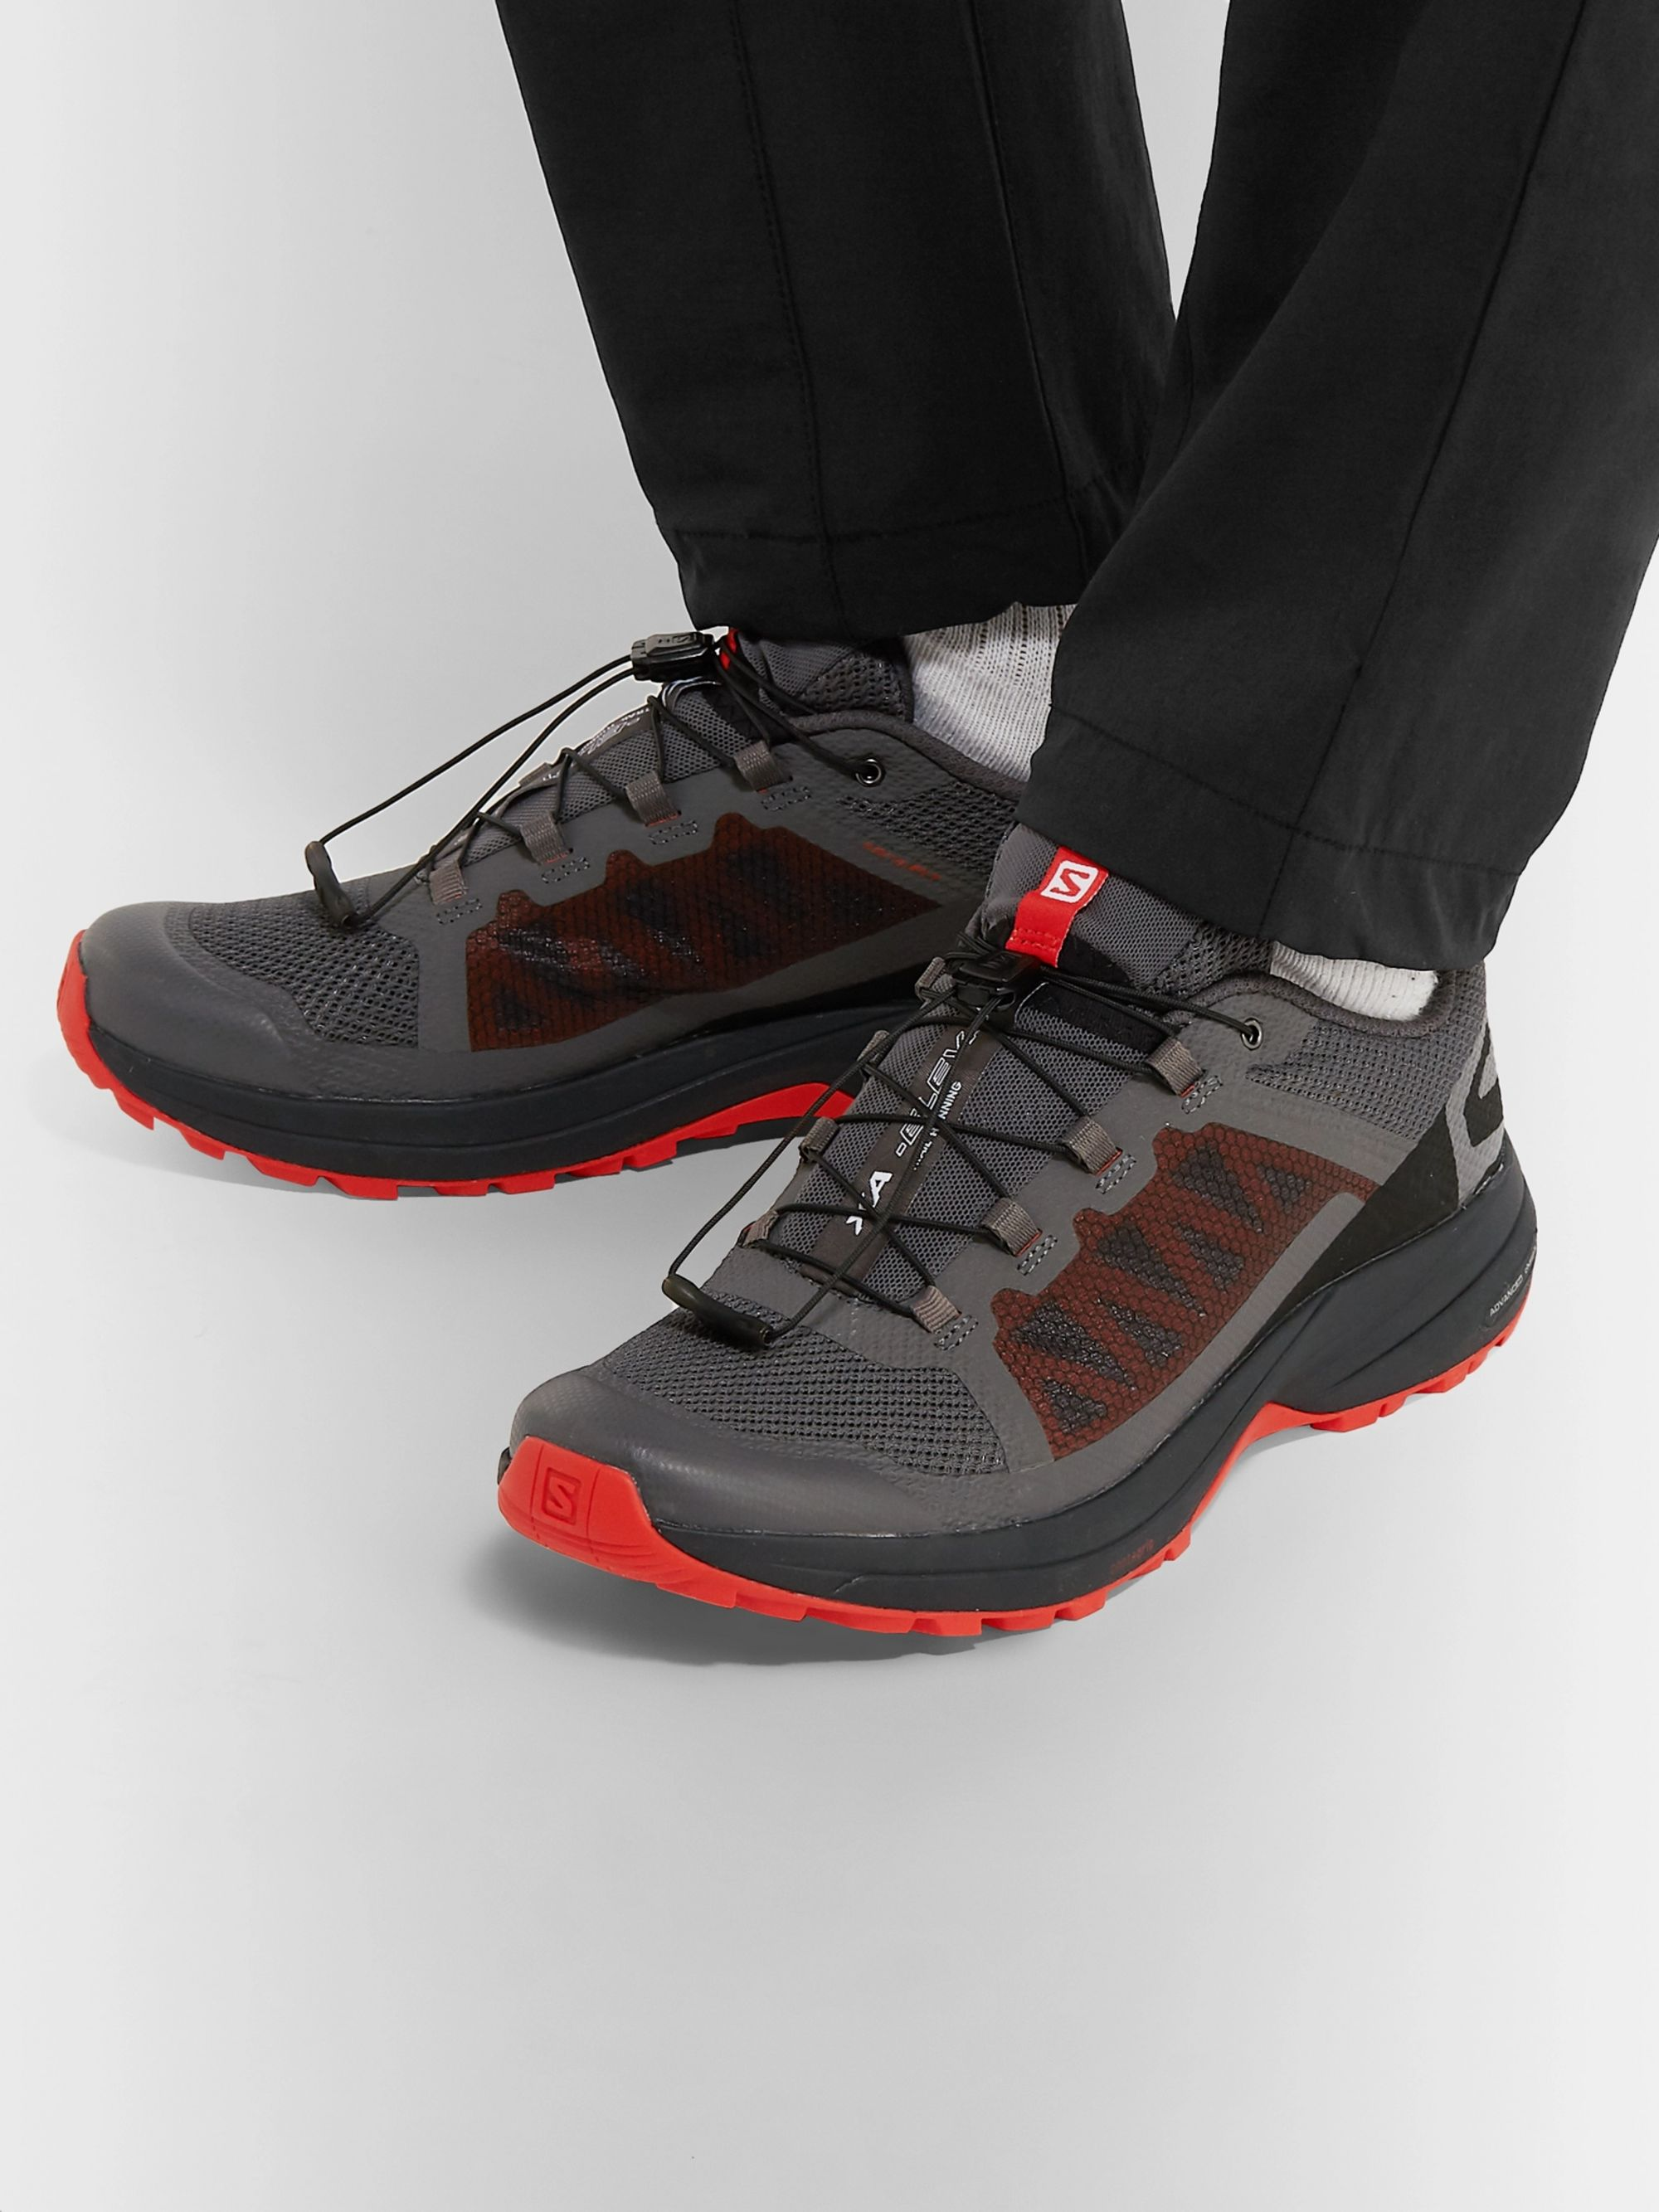 lowest price e224c e66d5 XA Elevate GORE-TEX Trail Running Sneakers